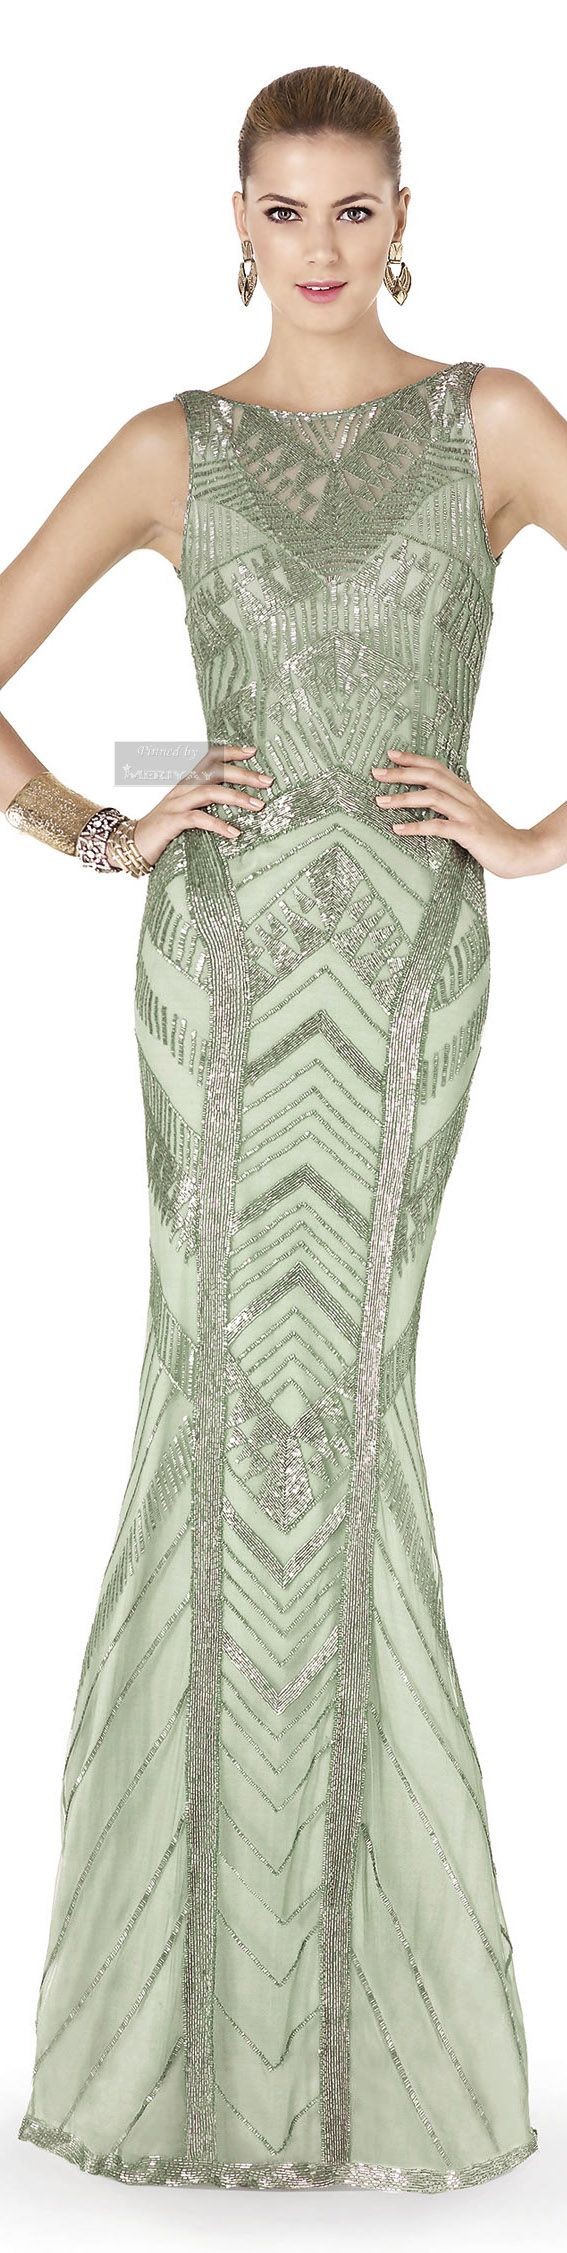 Pronovias. 2015 Party Dress Collection.